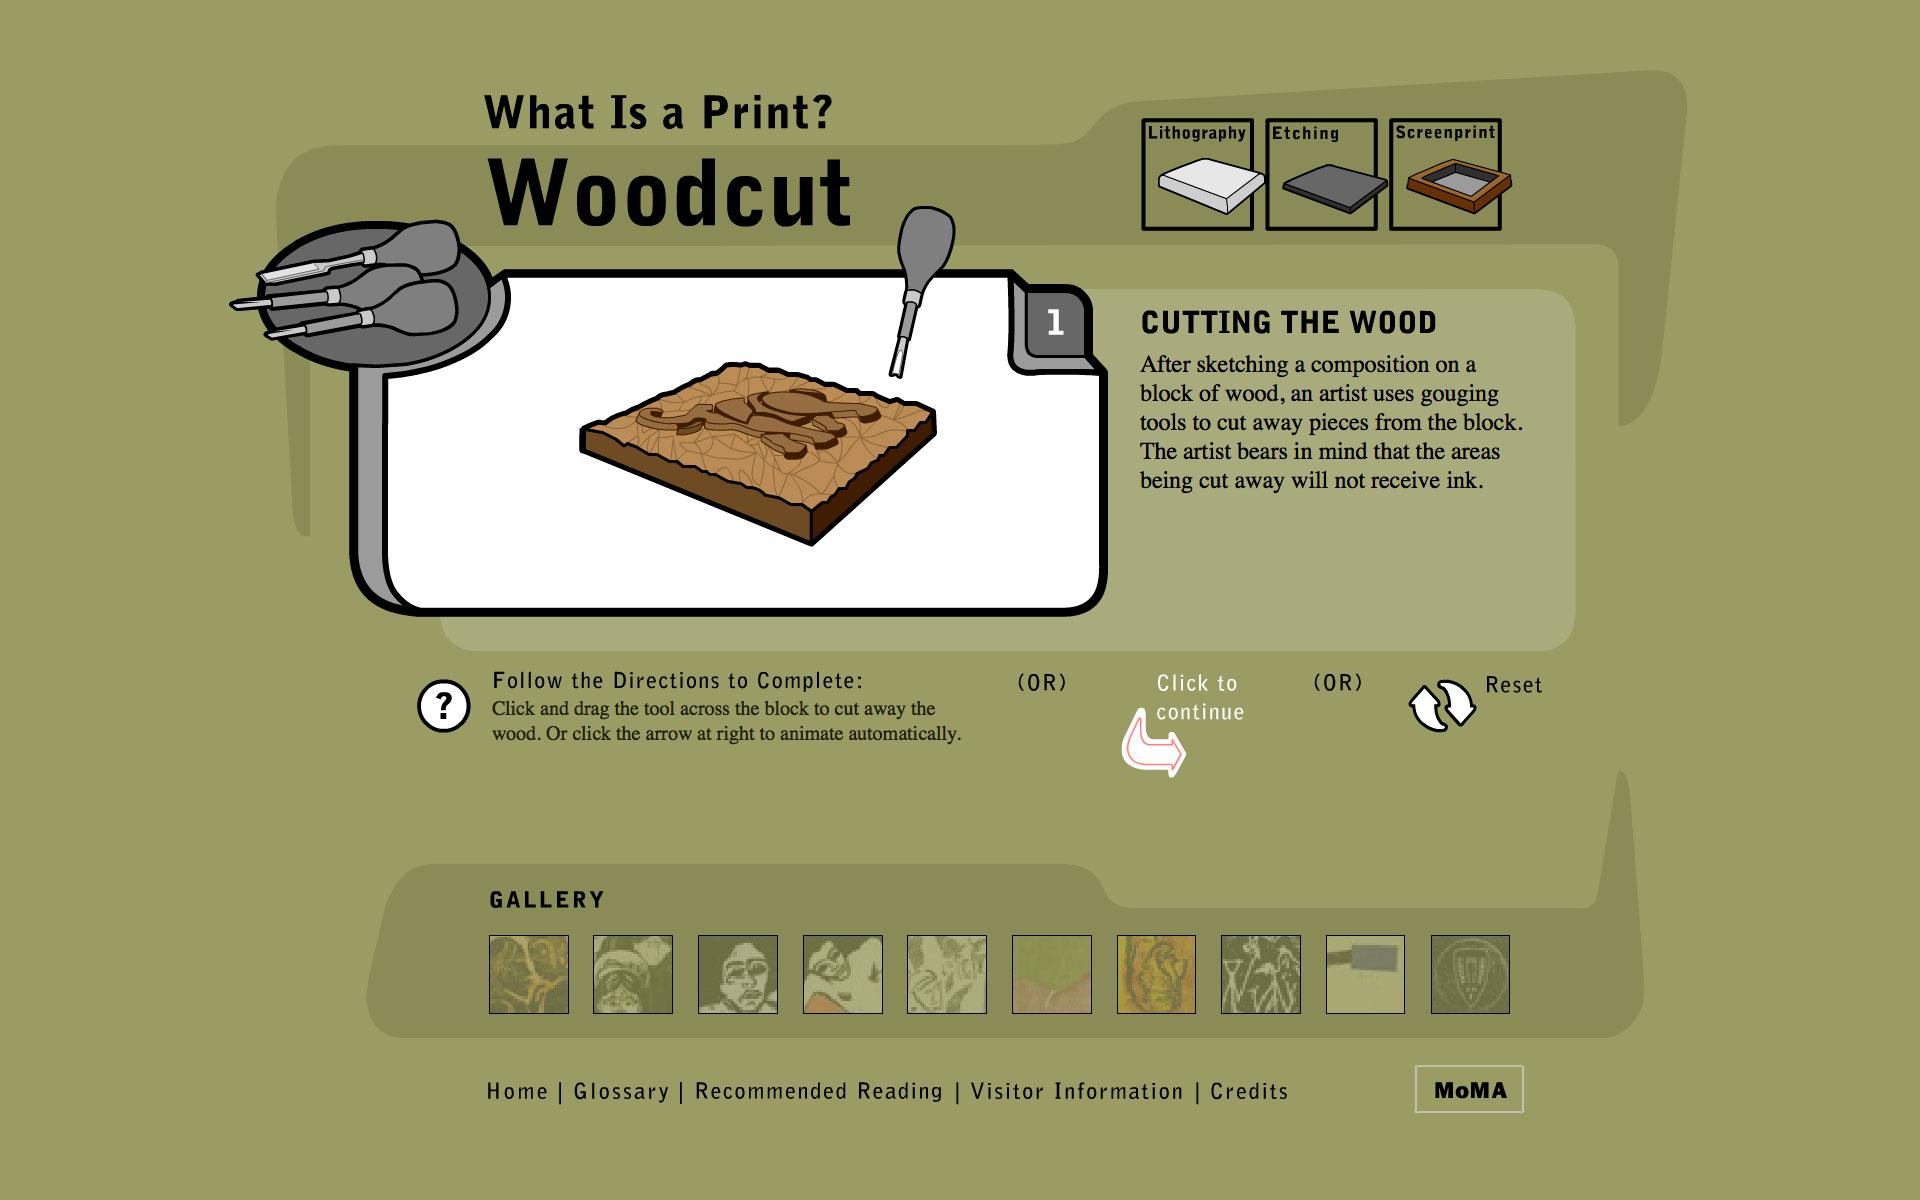 Portfolio-MoMA-WIAP-Woodcut-Carve.jpg